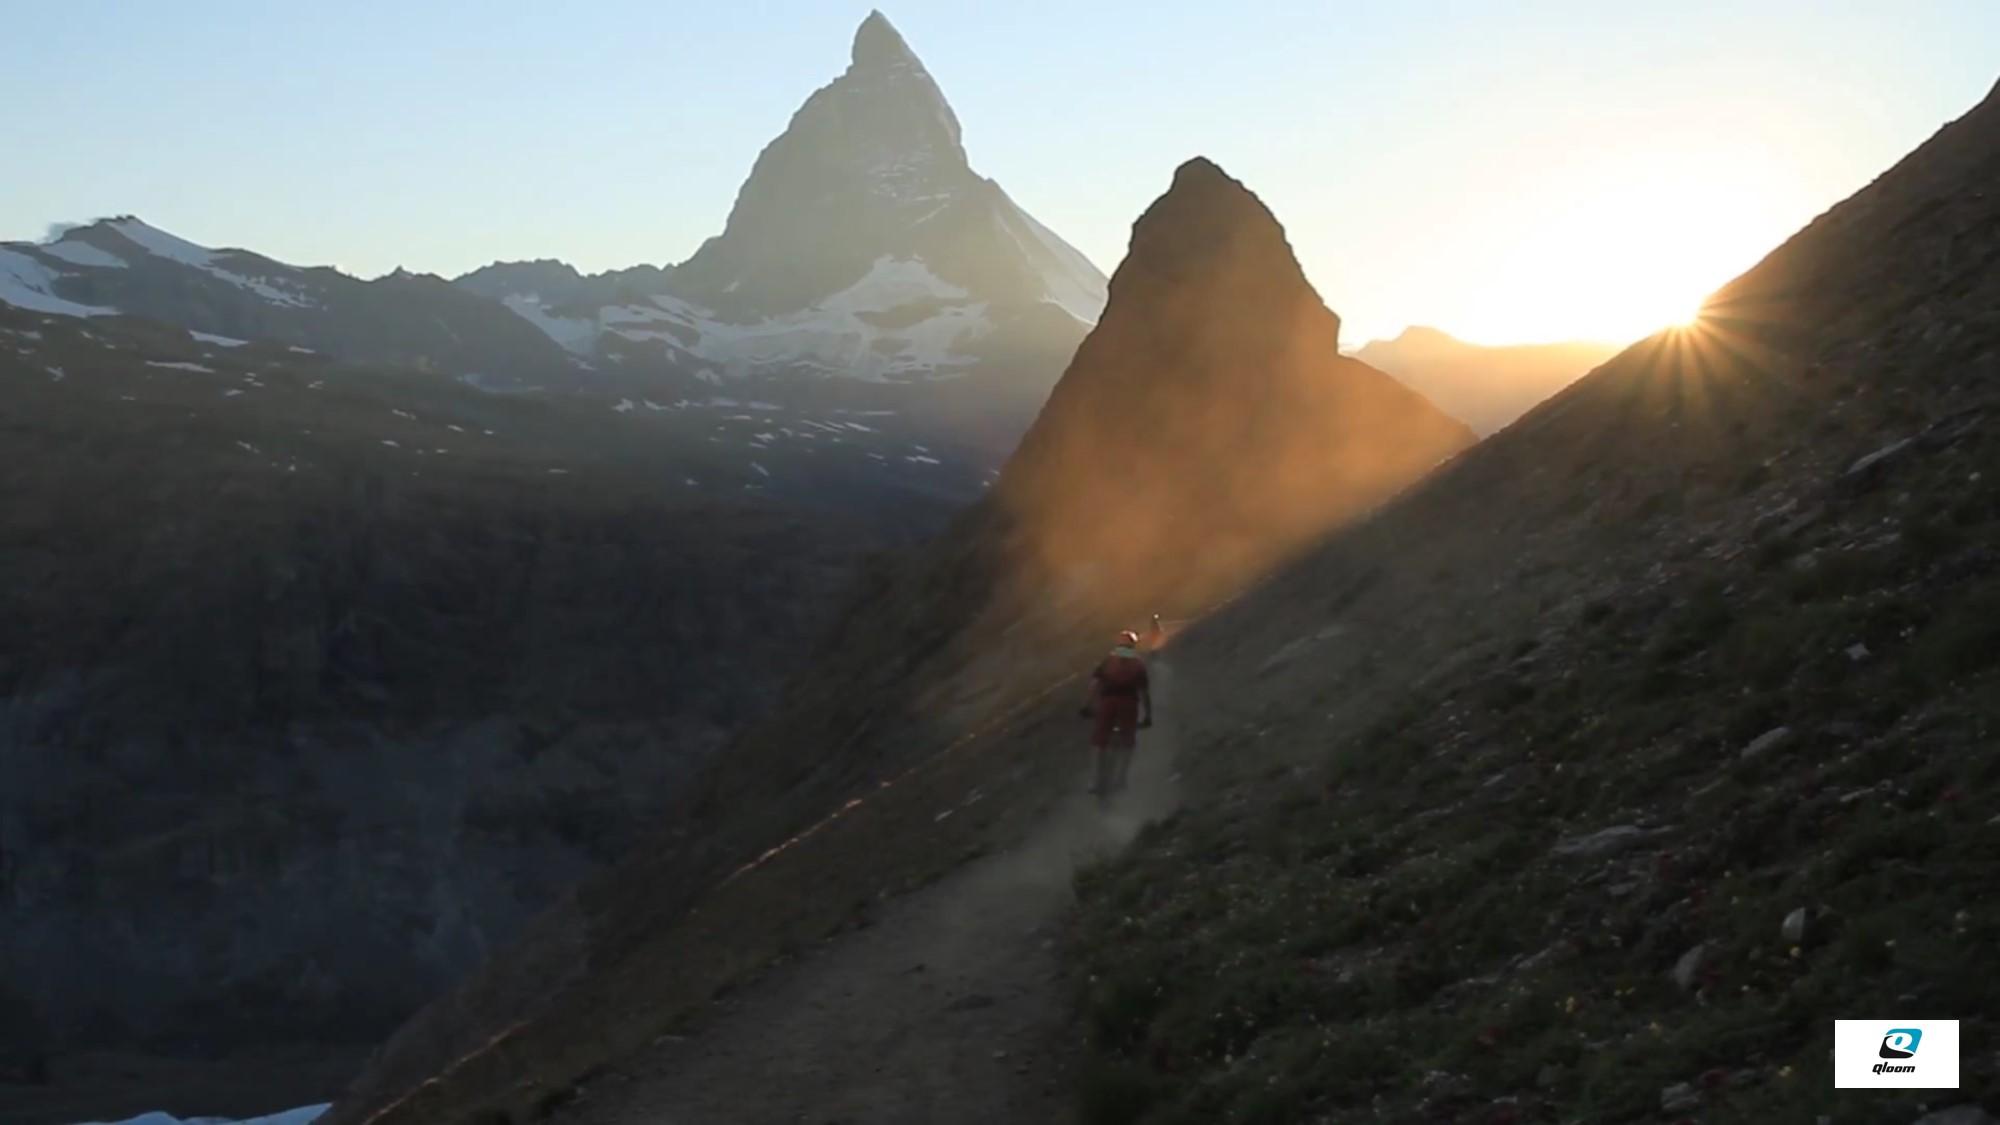 Enduro Mtb viaje Alpes